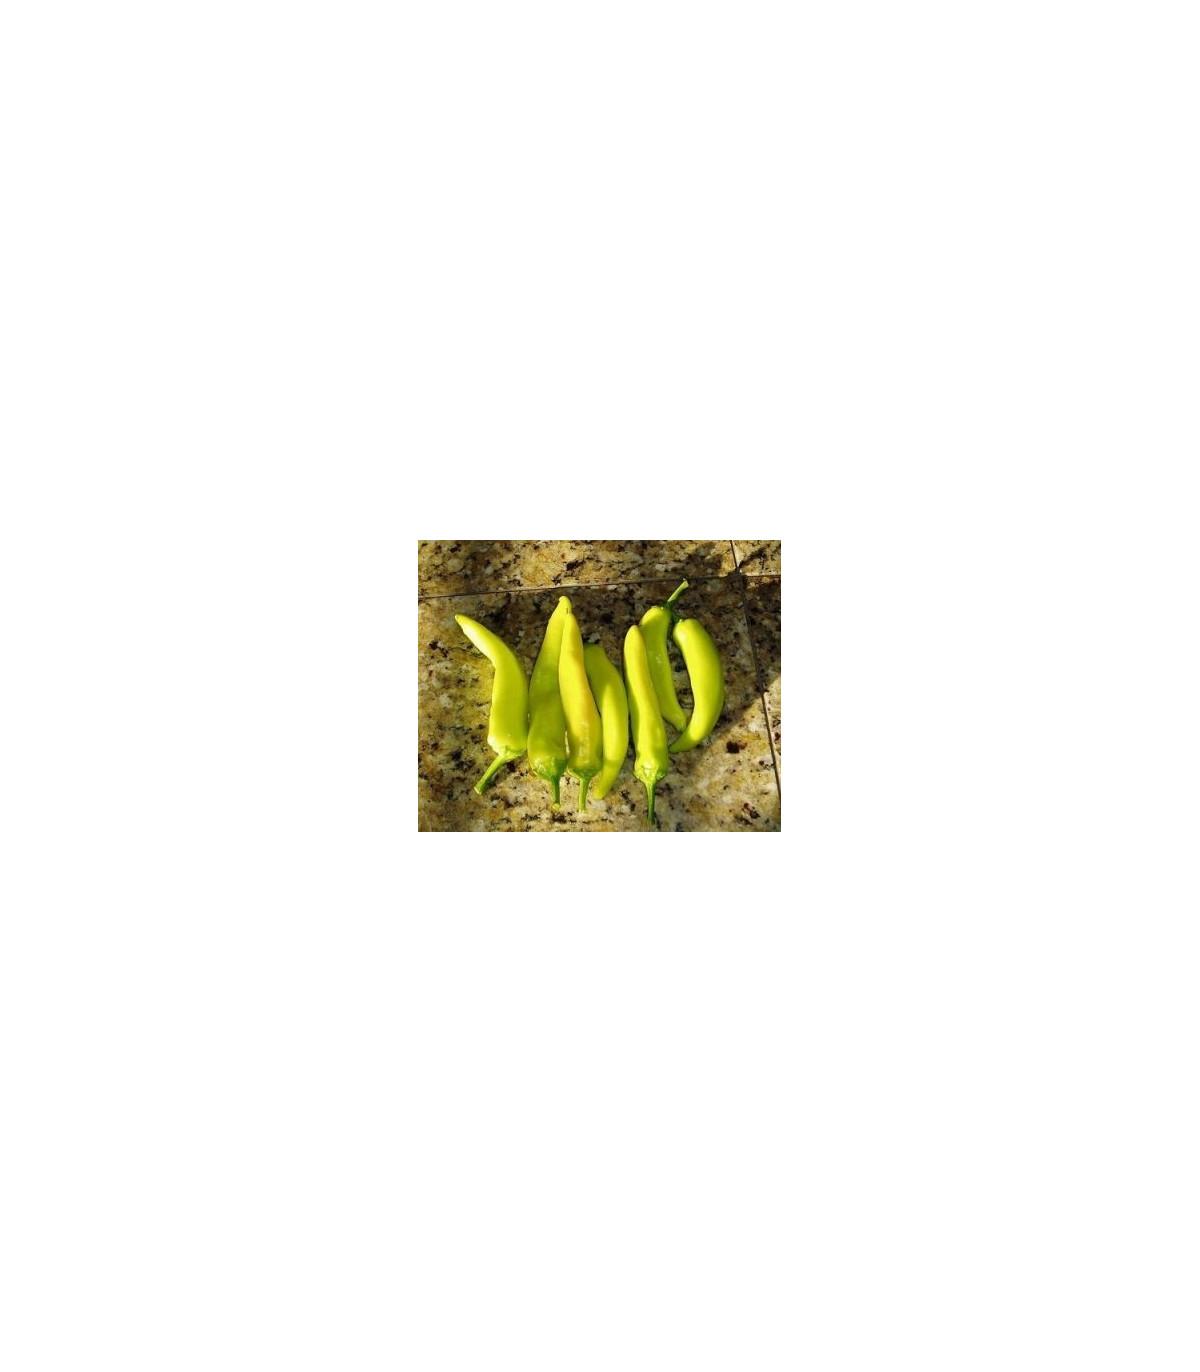 Chilli maďarský vosk - semena Chilli papriček - rostlina Capsicum annuum - 6 ks